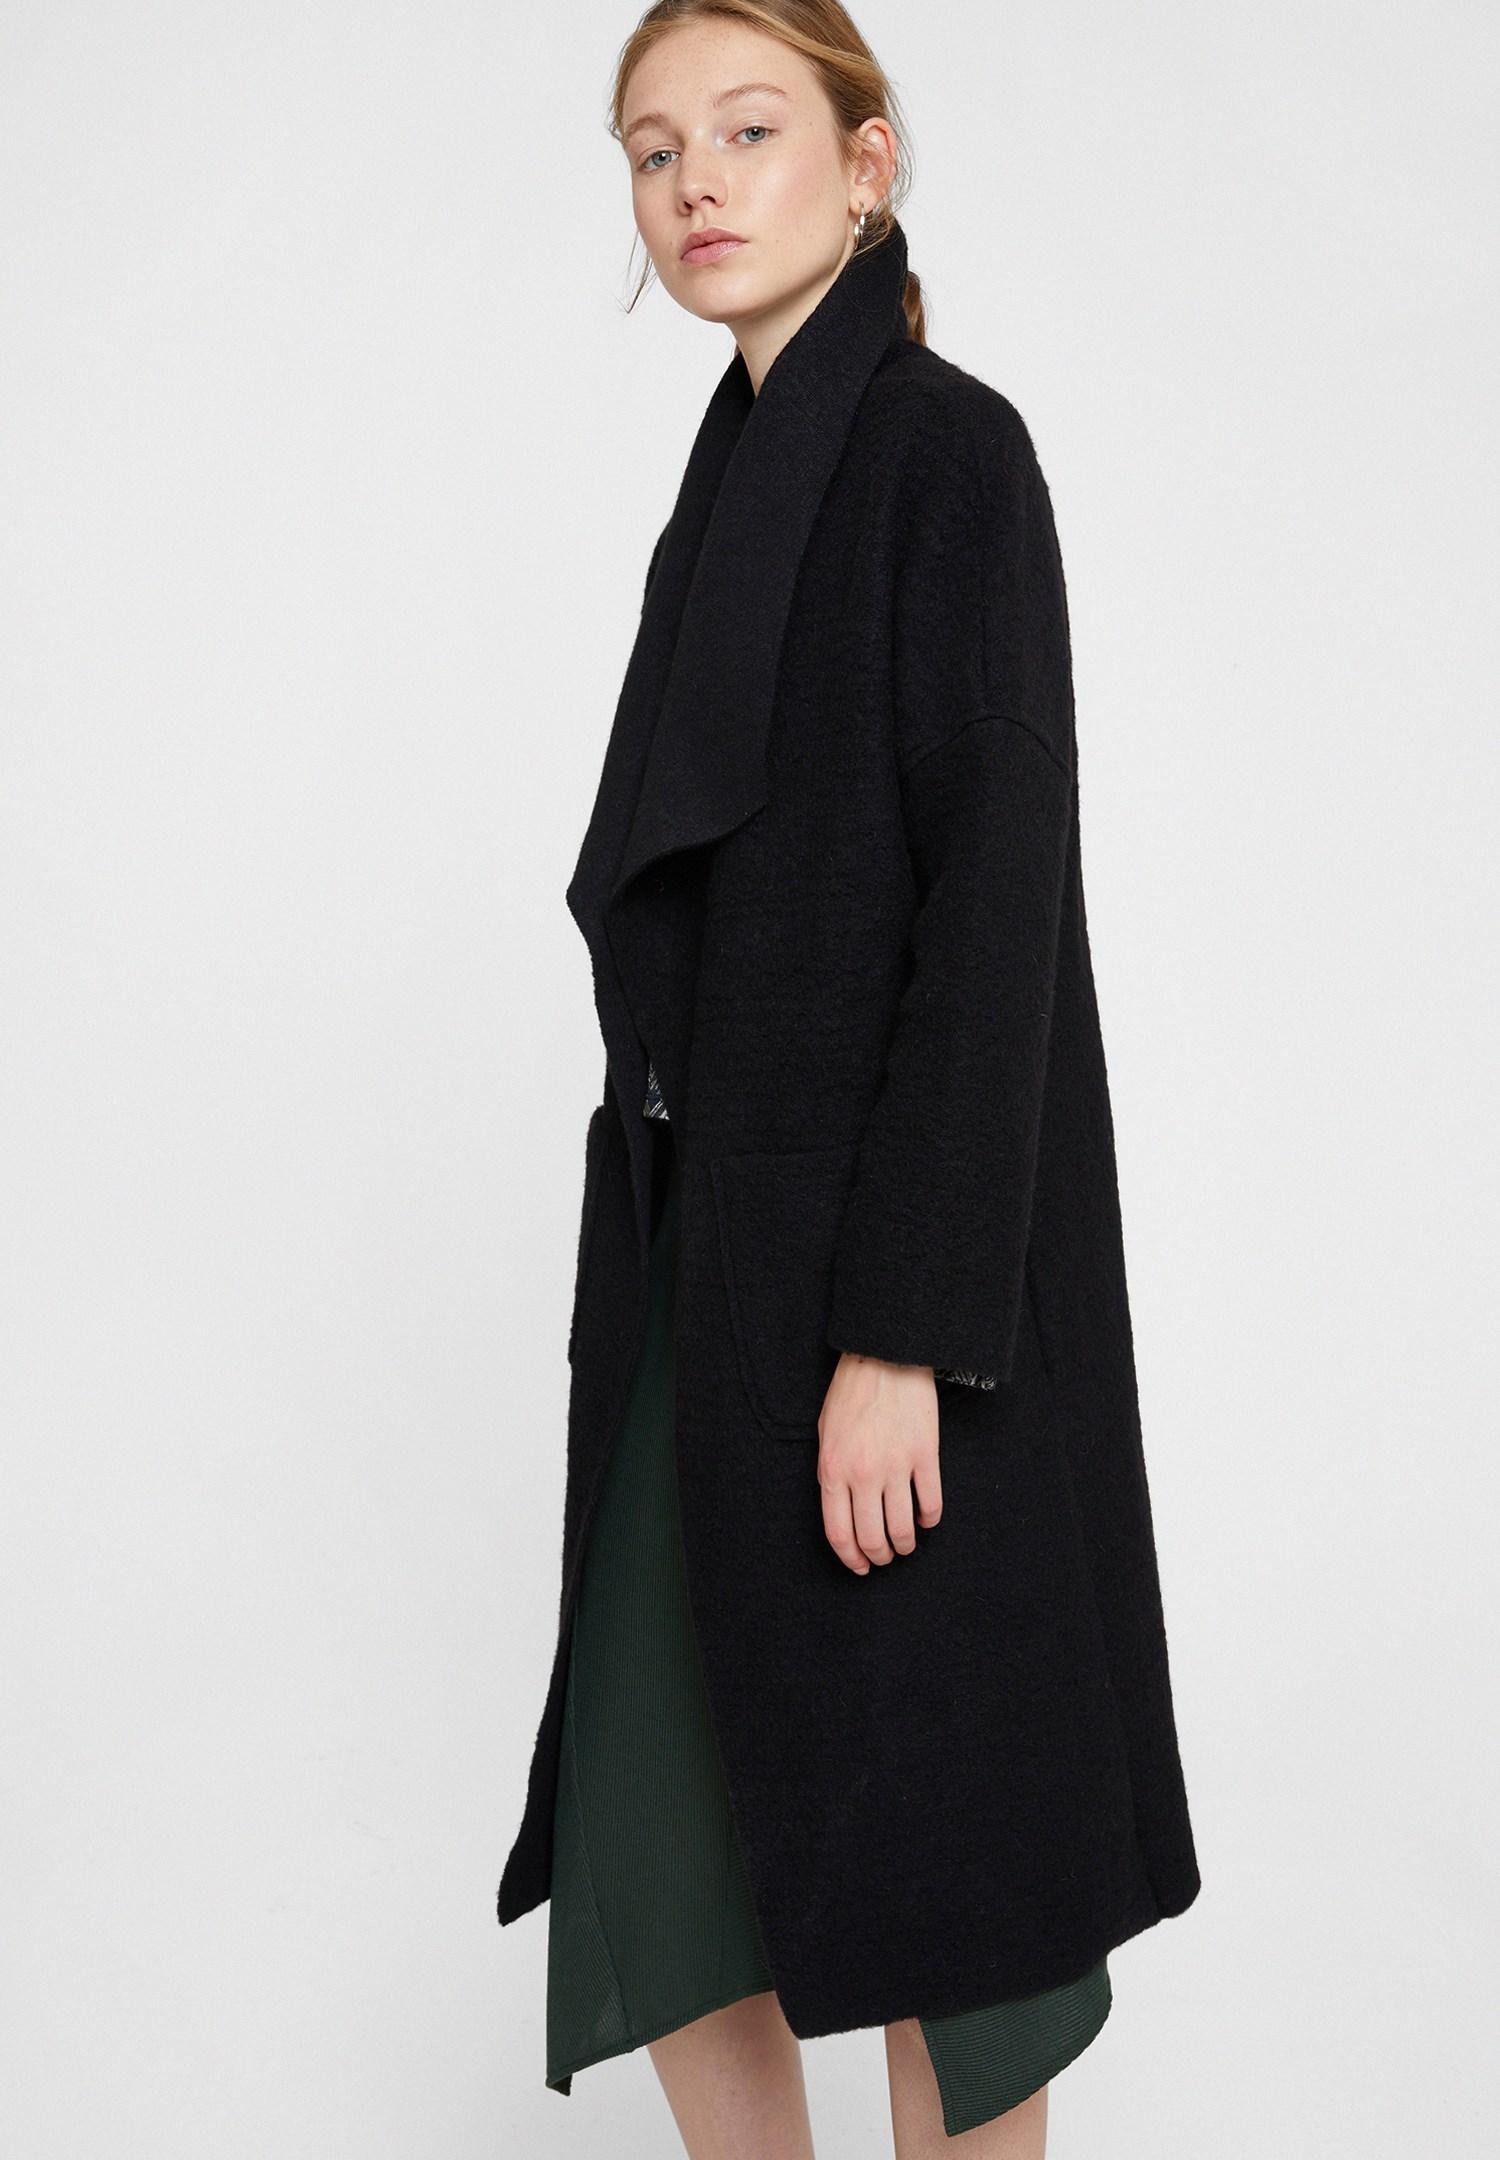 Women Black Wool Jacket with Pocket